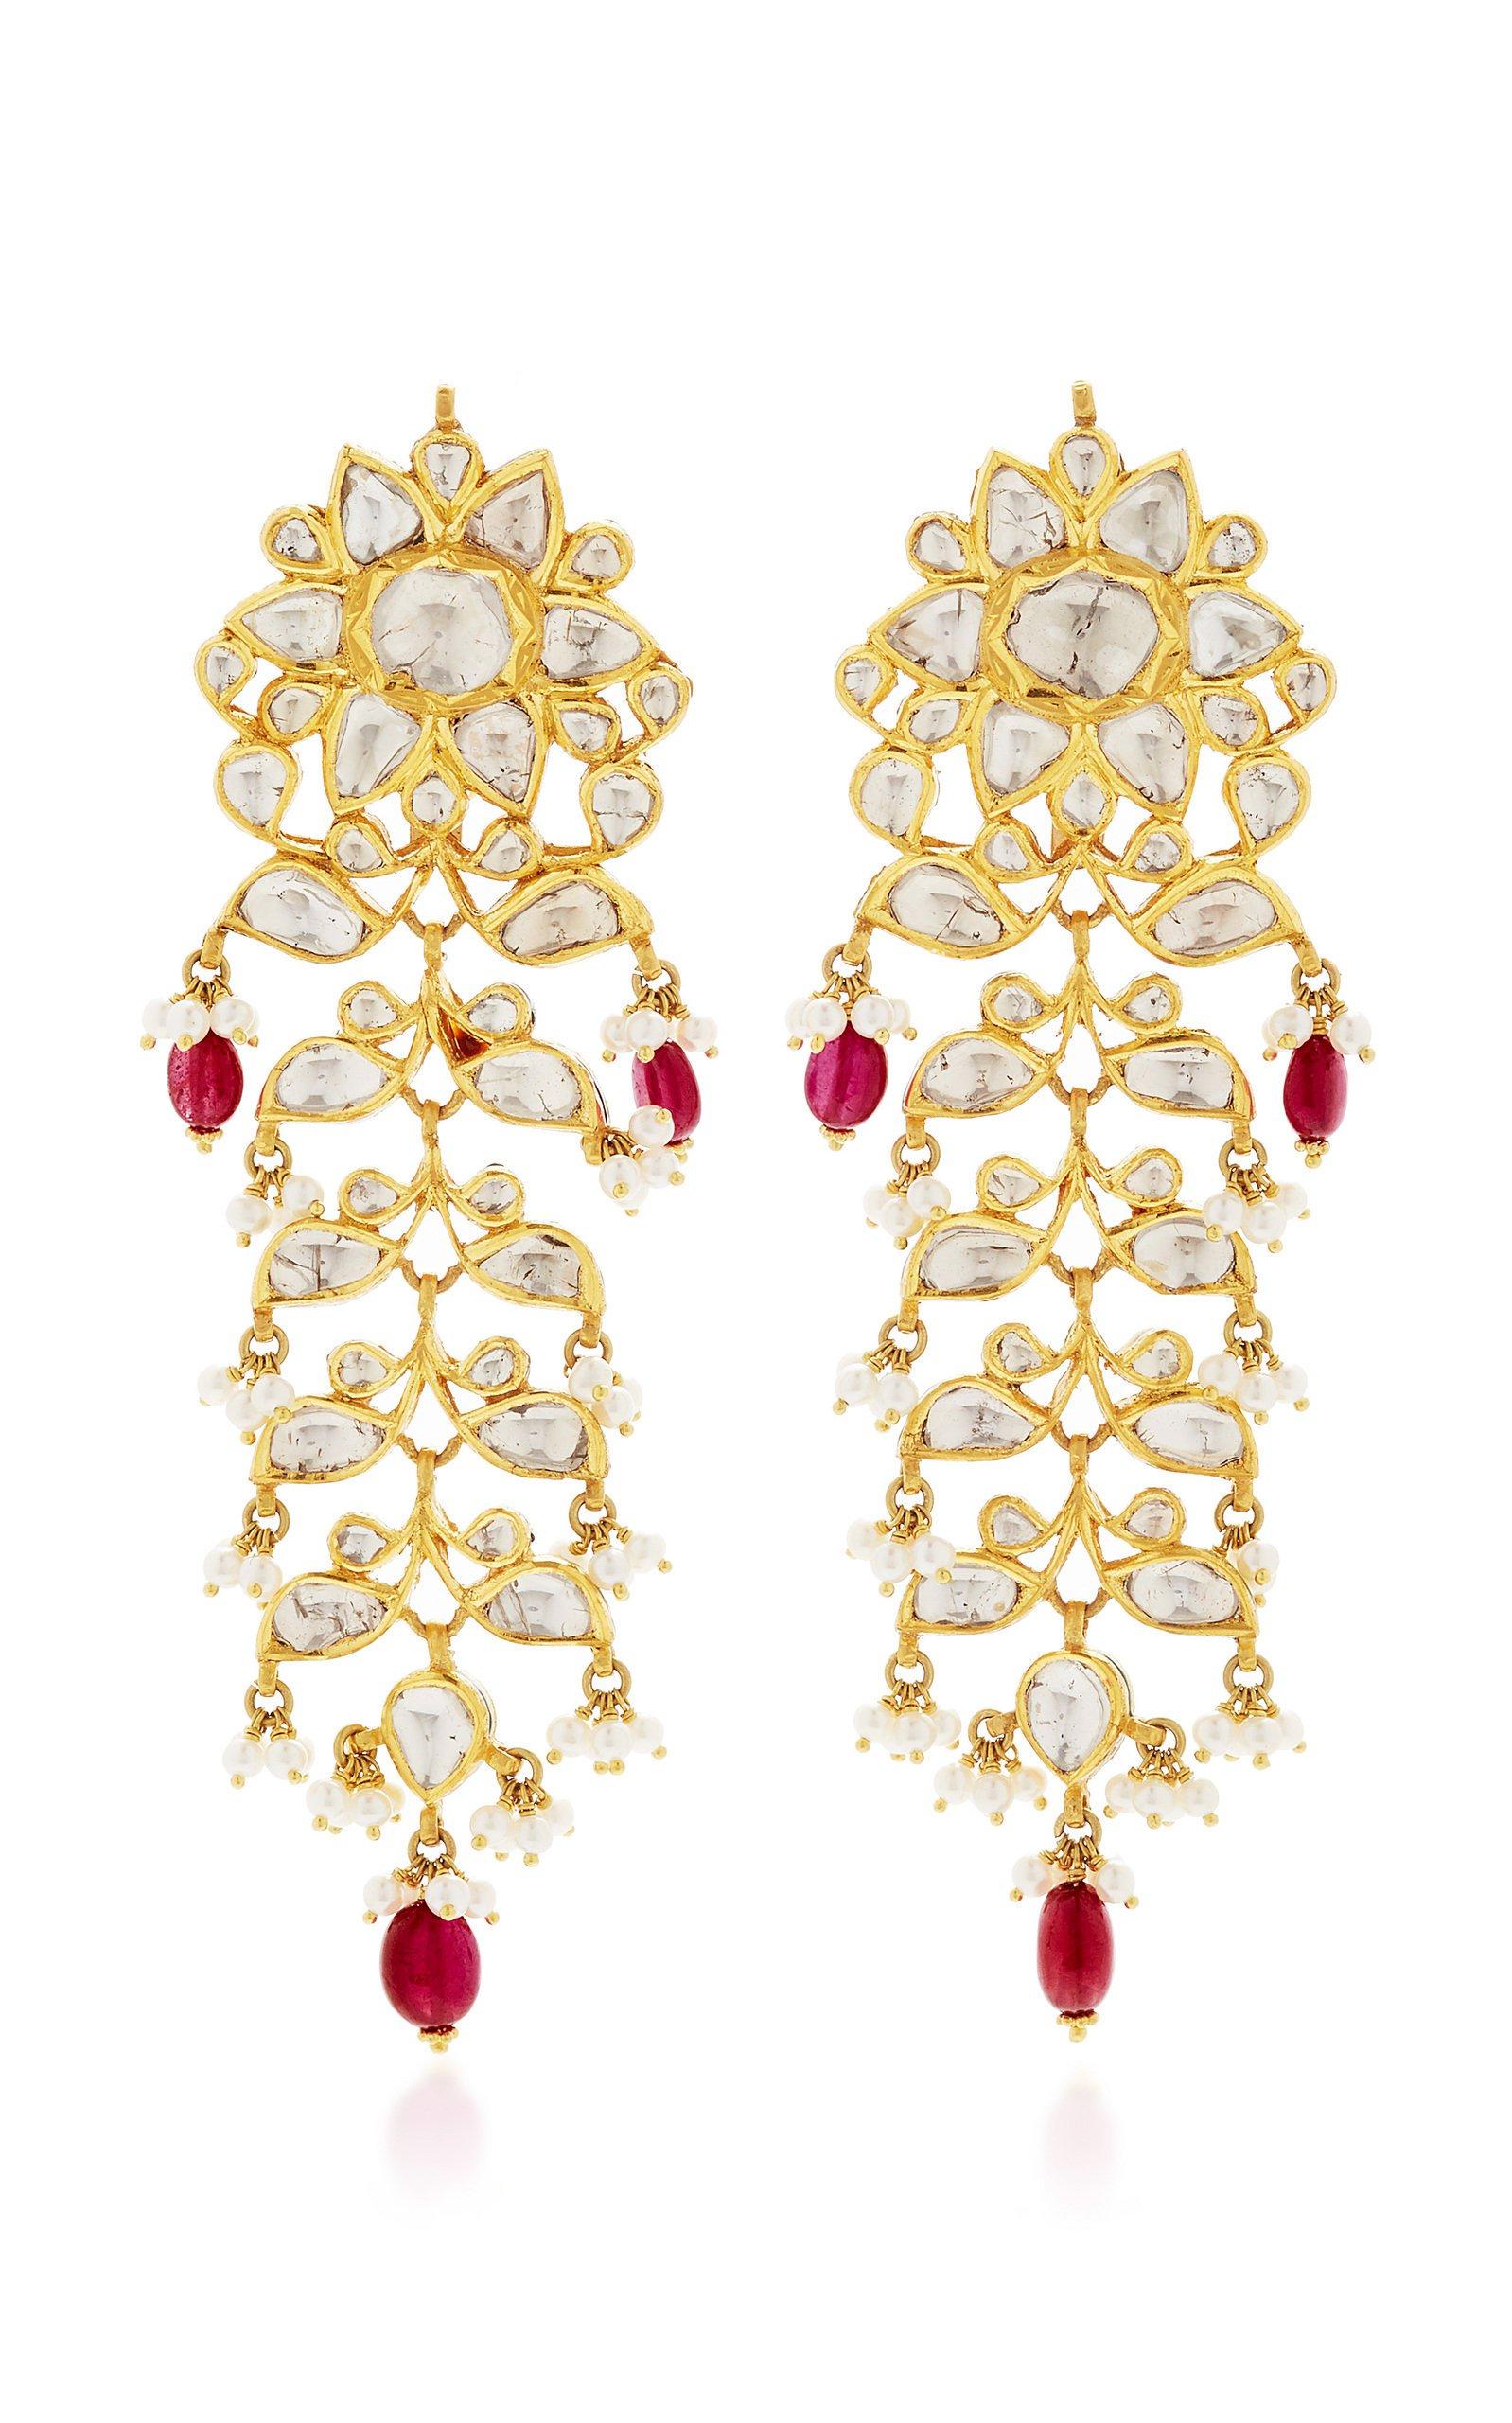 Raj 22k Gold, Ruby, and Diamond Earrings by Sanjay Kasliwal | Moda Operandi